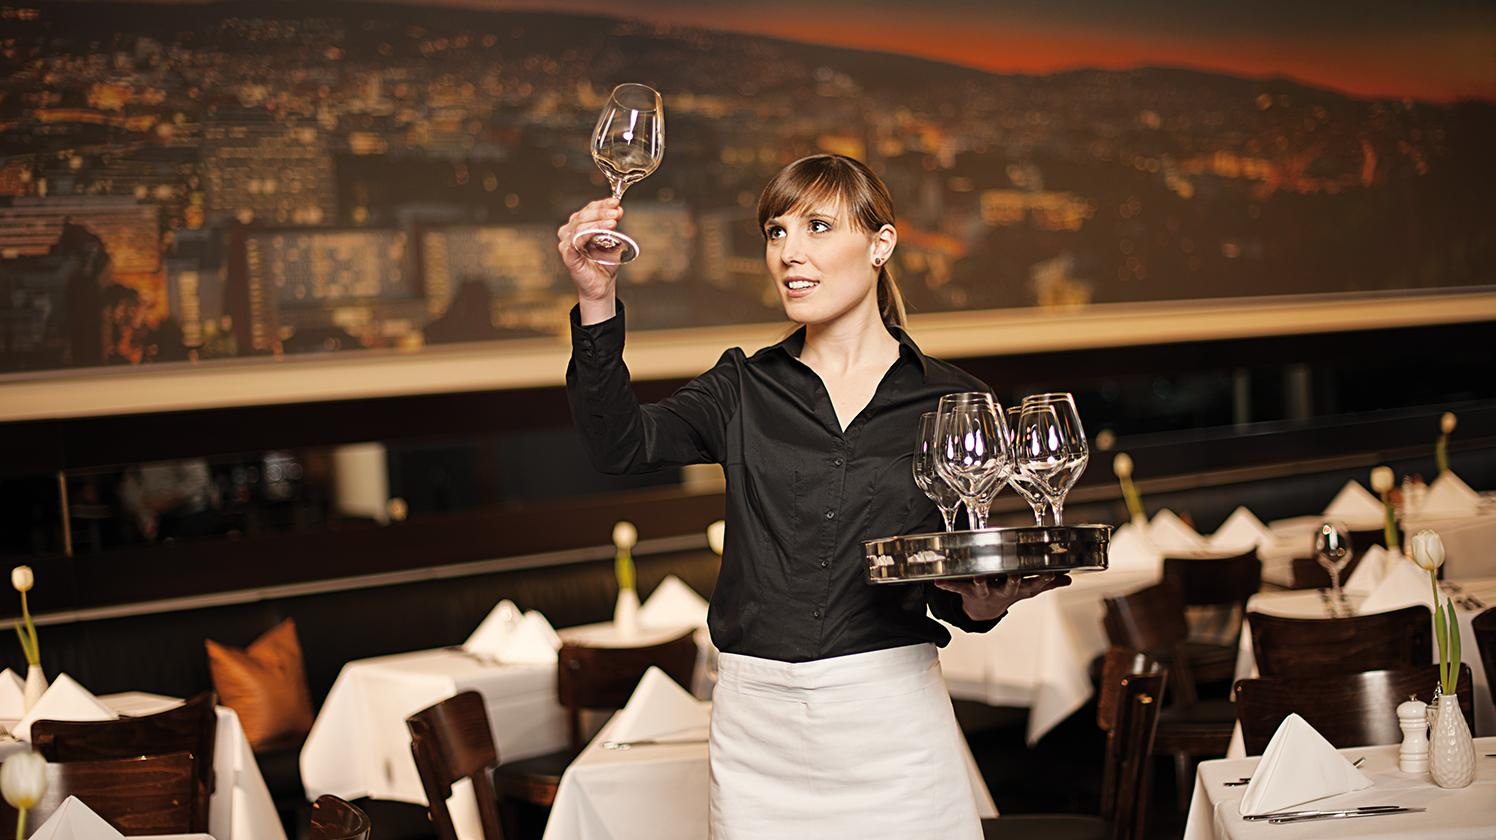 dispensador de agua restaurantes camarera con copa